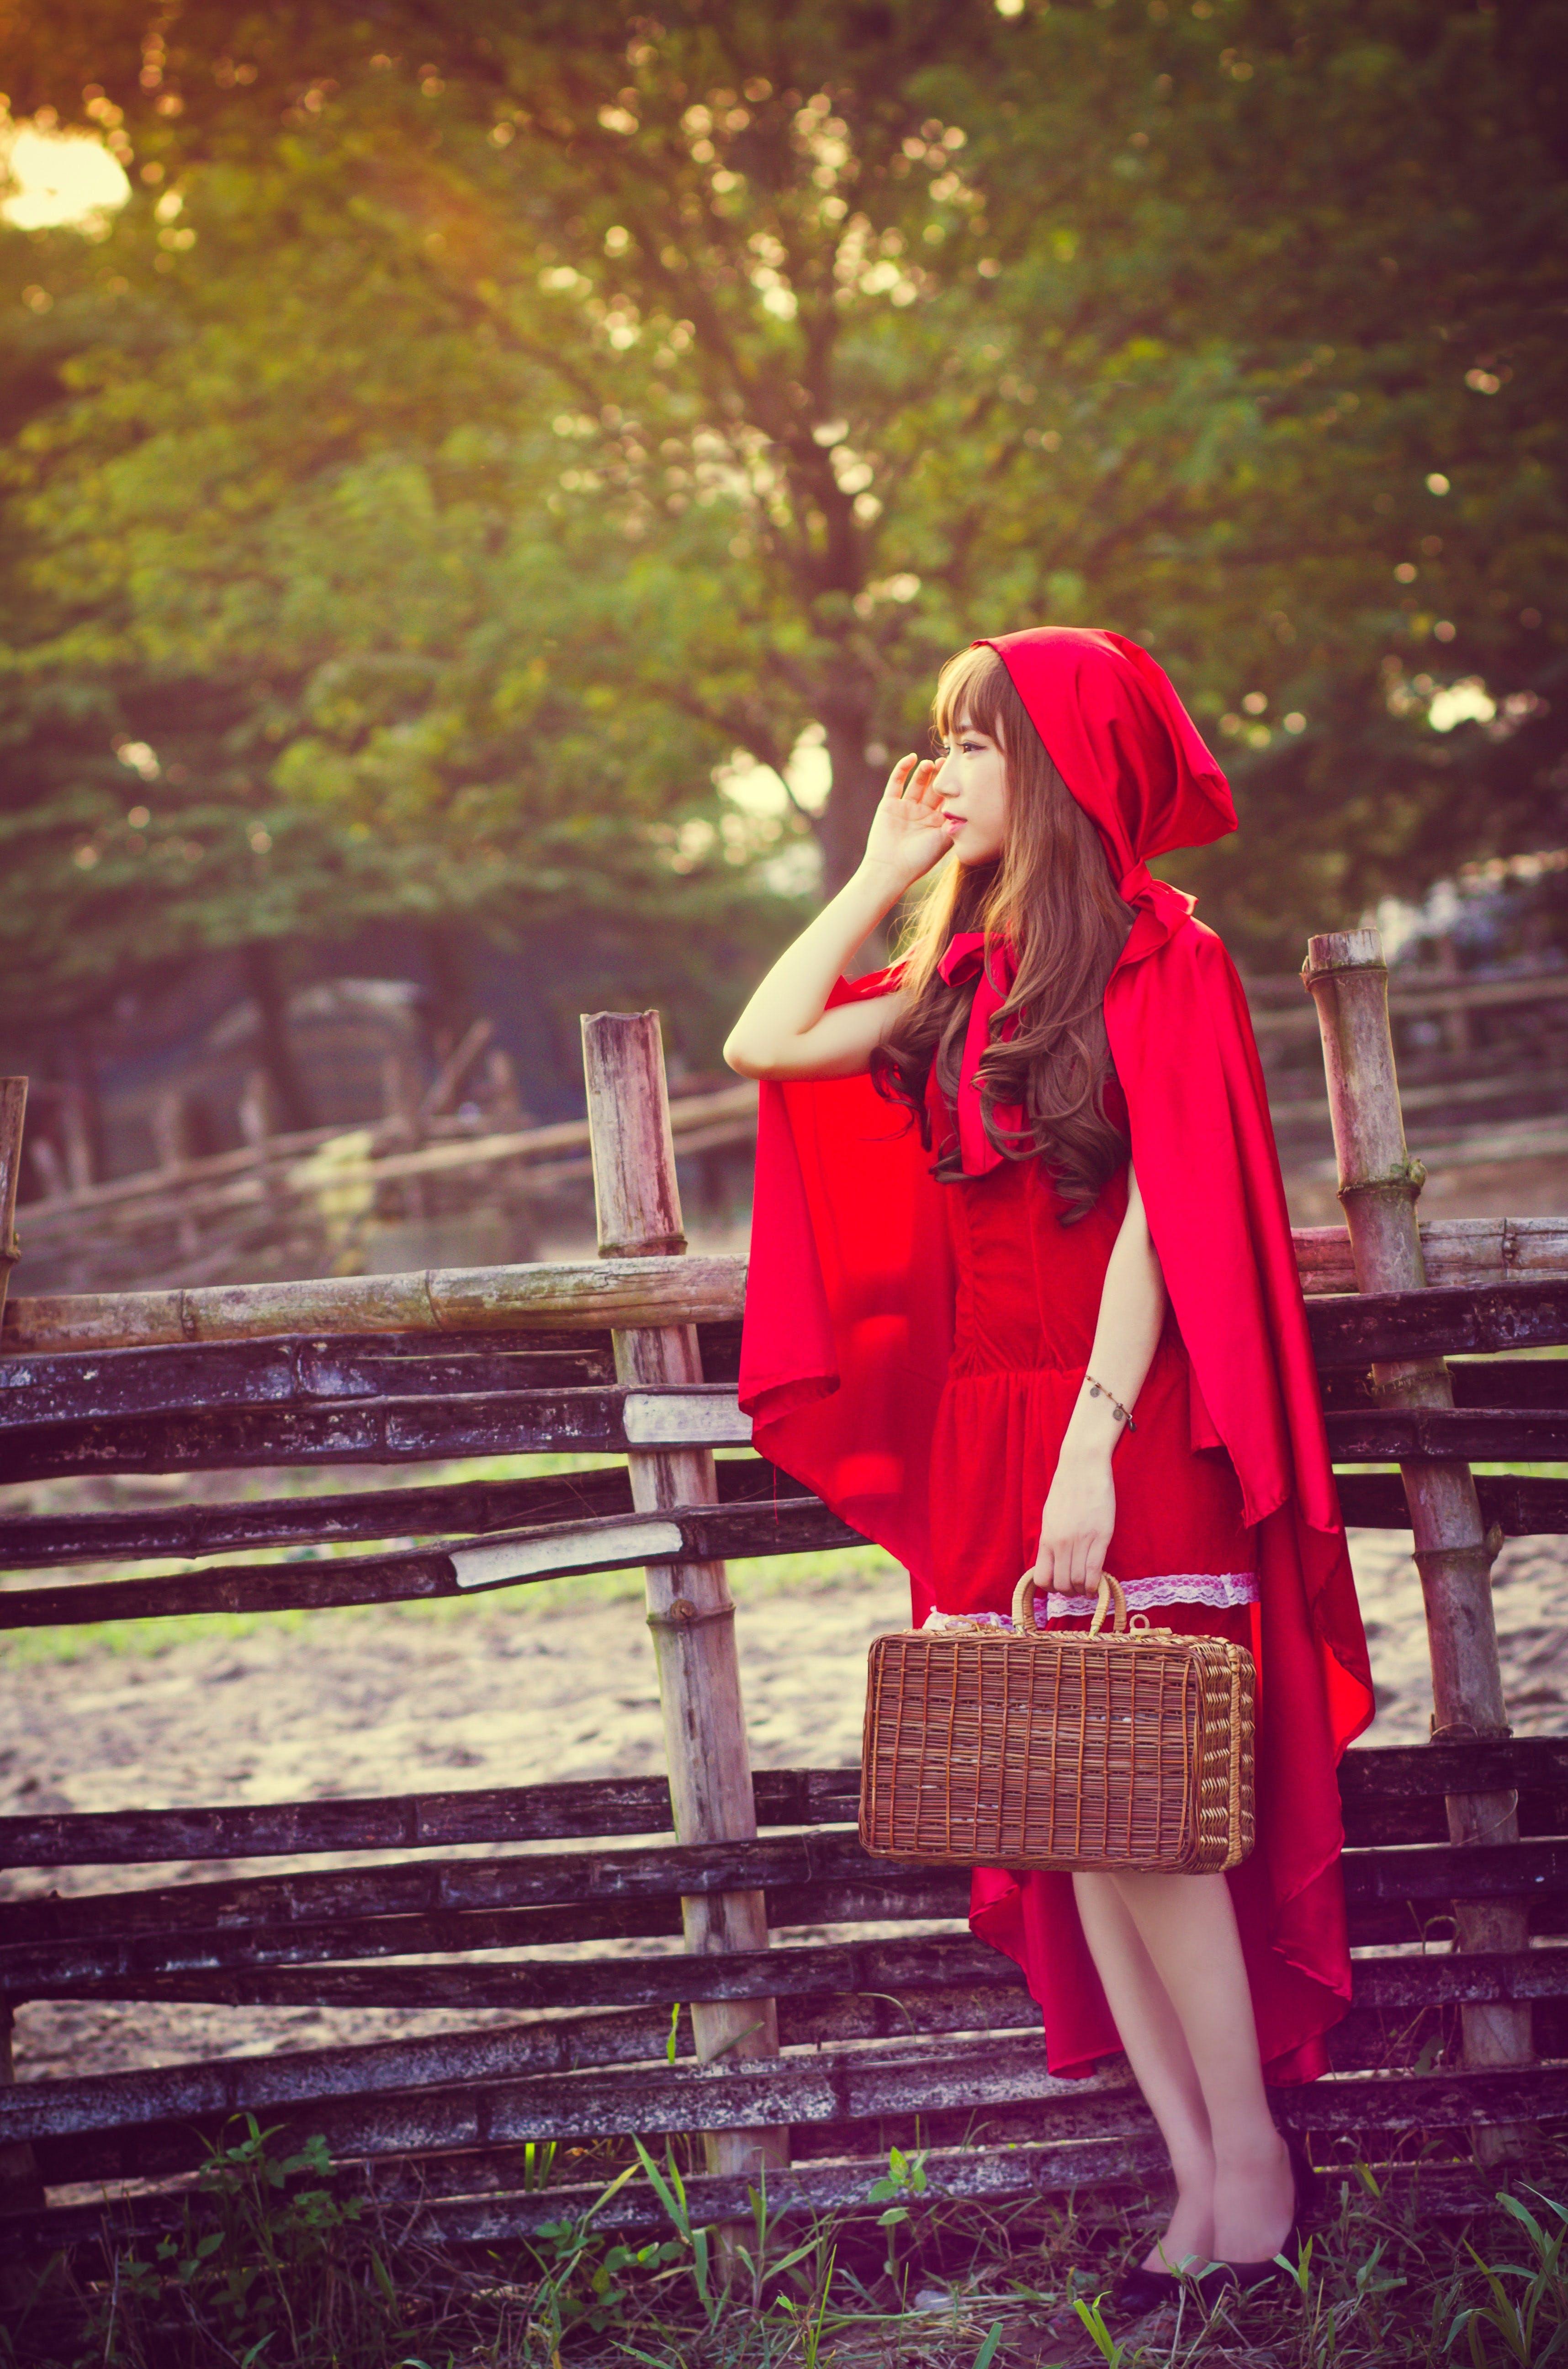 Kostenloses Stock Foto zu bäume, erwachsener, fashion, fotoshooting